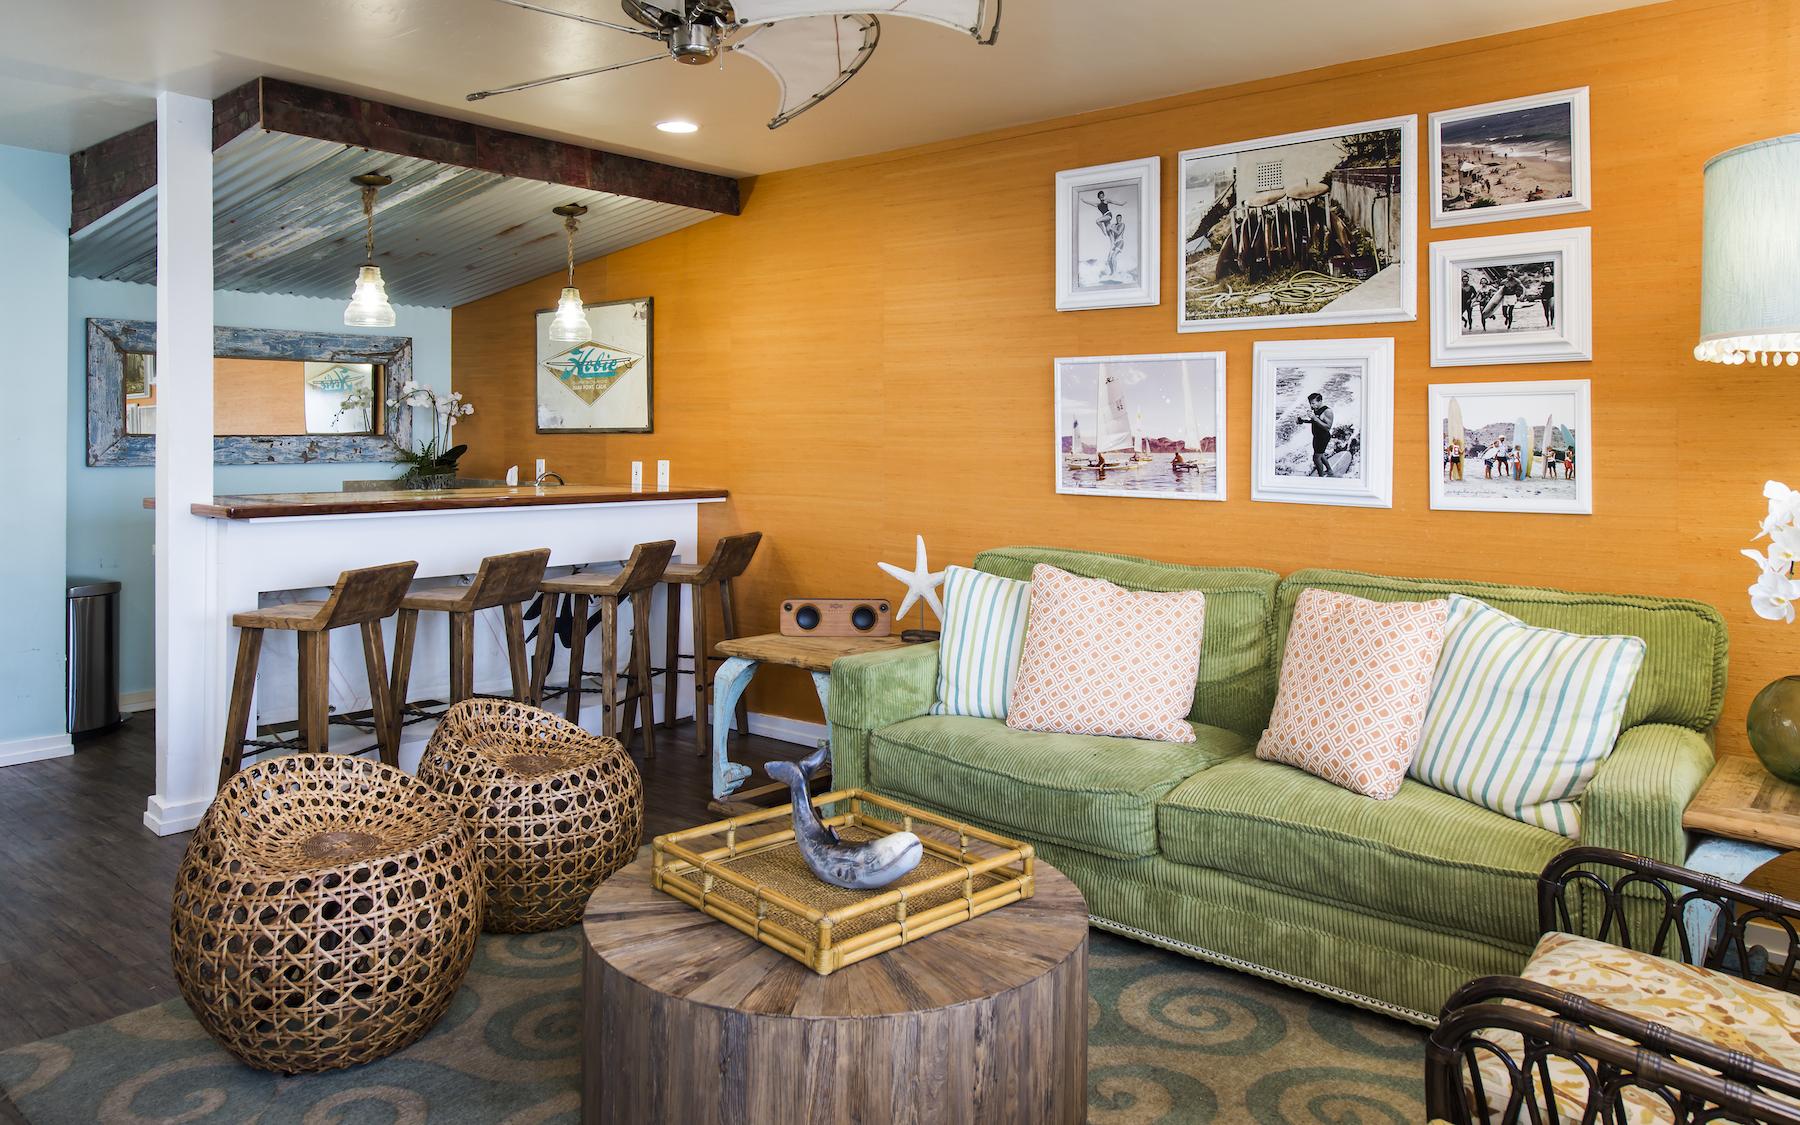 Pacific-Edge-Hotel-Laguna- Beach-Bungalow-1.JPG